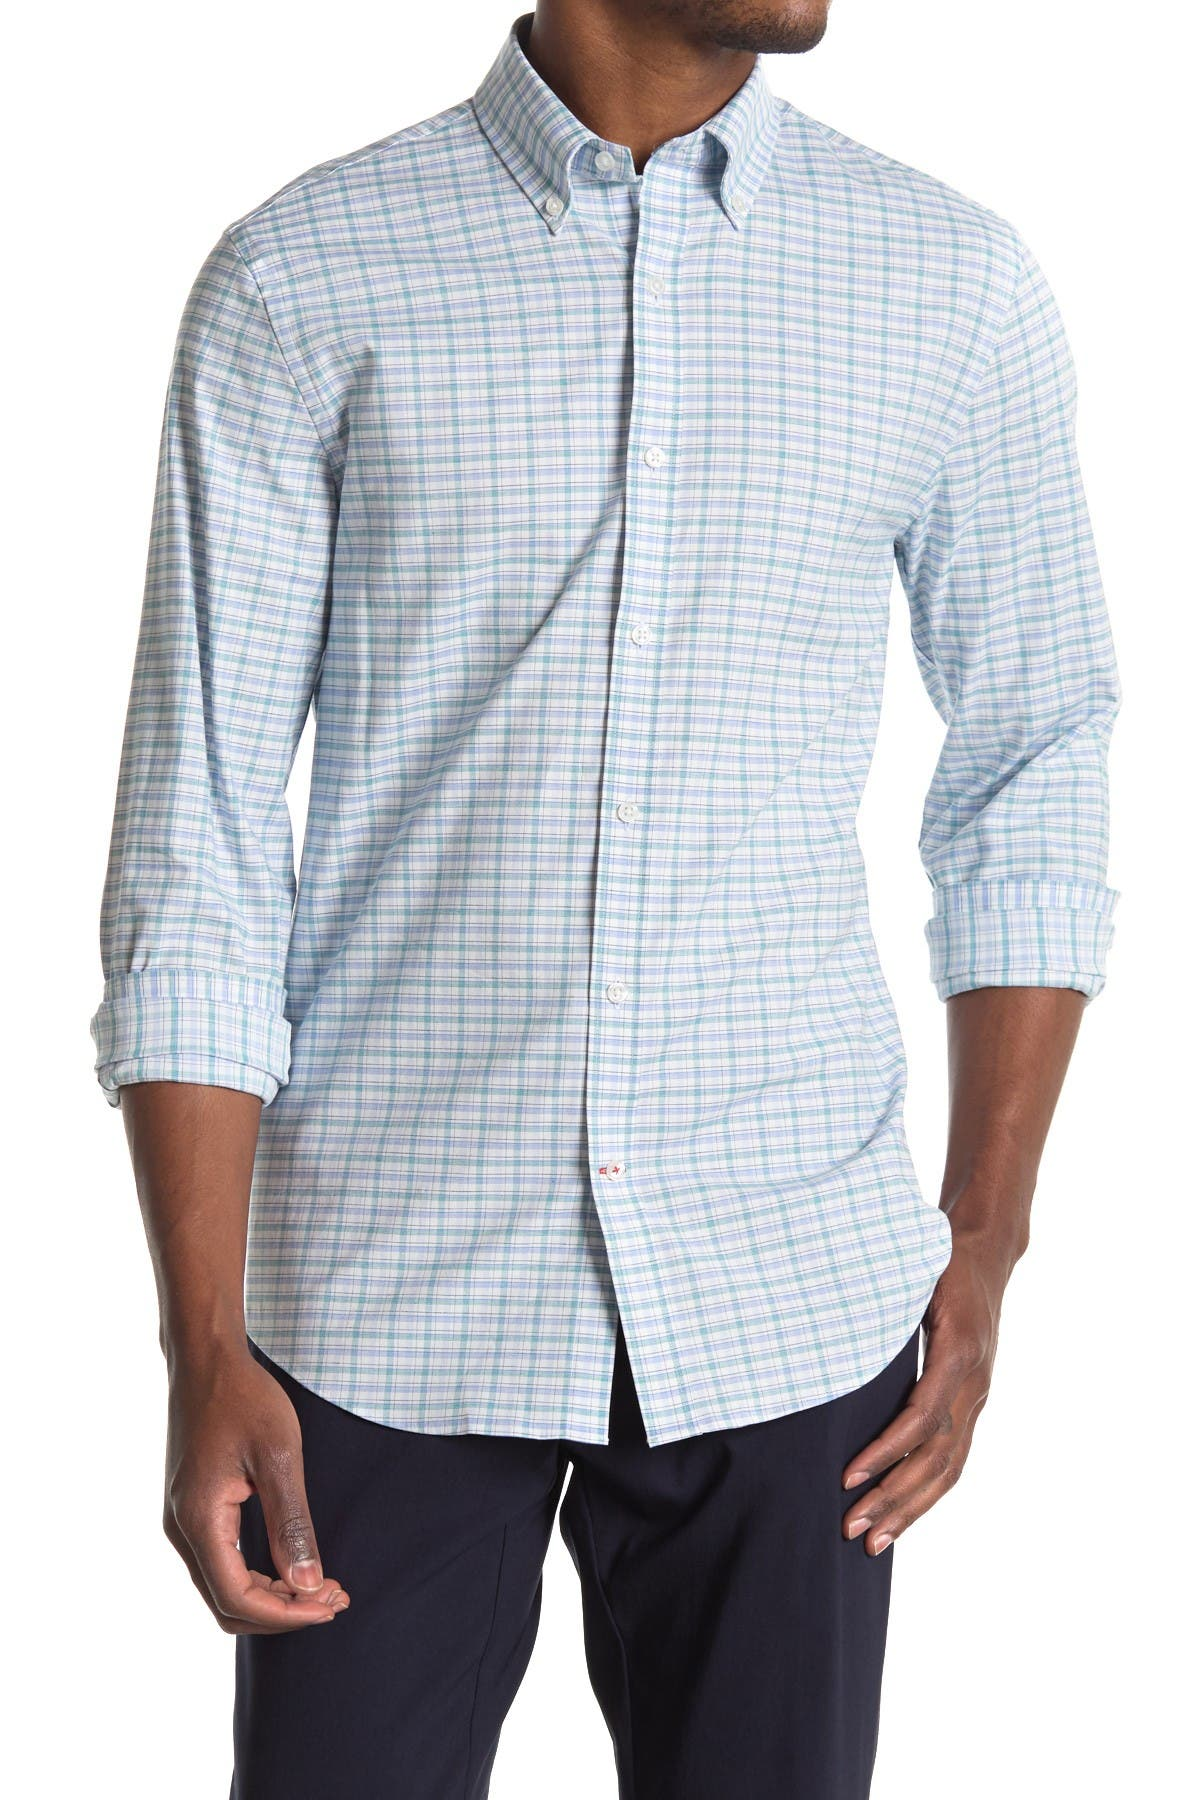 Image of Tommy Hilfiger Slim Fit Plaid Dress Shirt